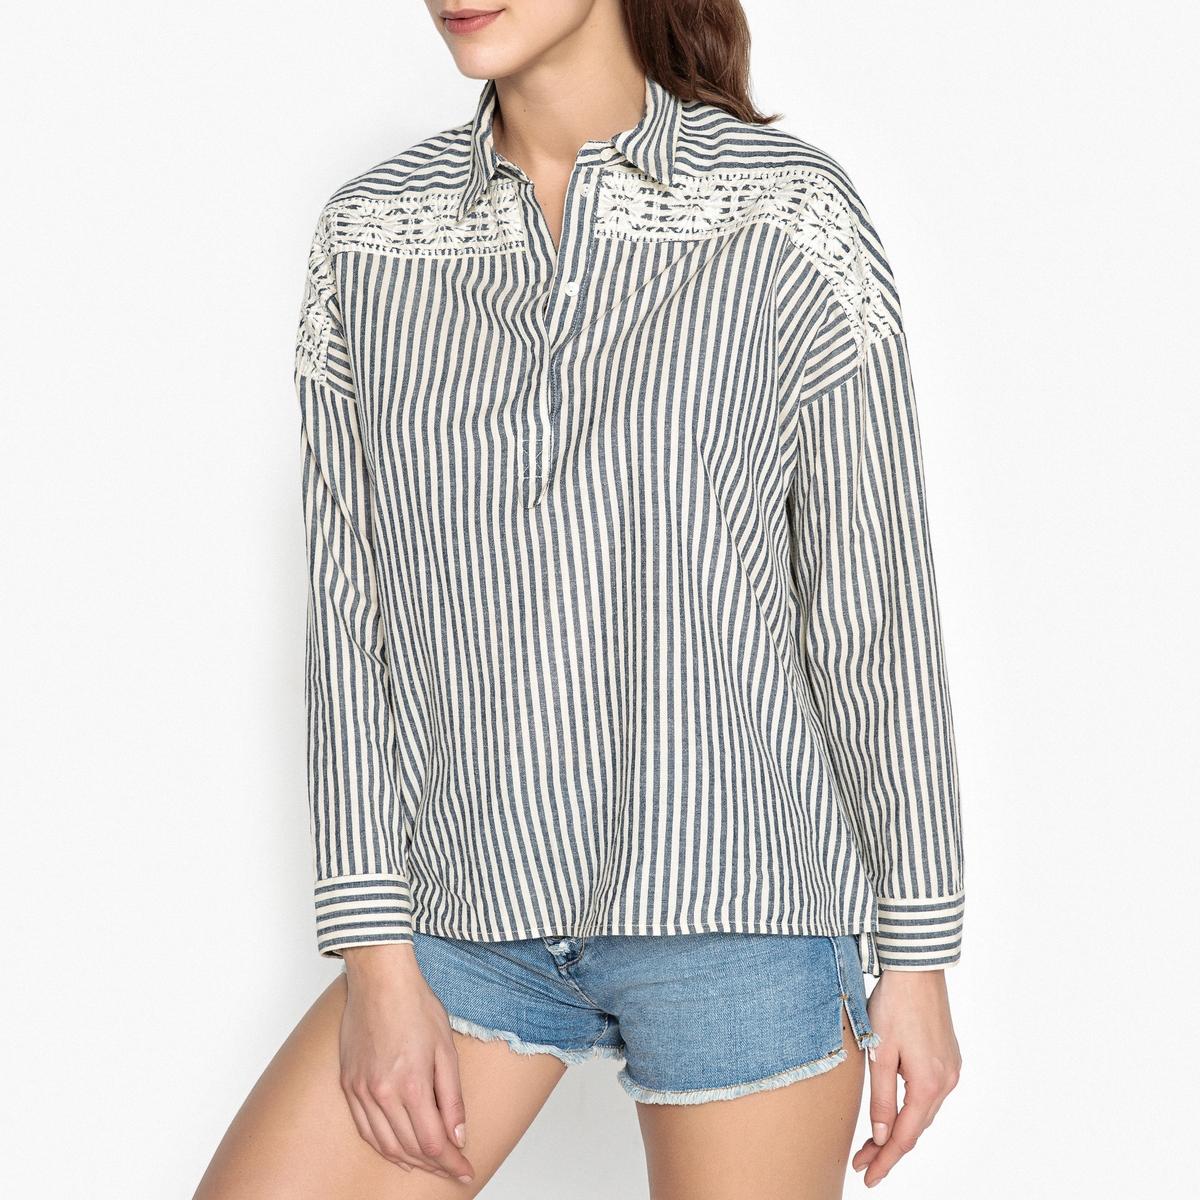 Рубашка в полоску объемного покроя OPHIA от BERENICE